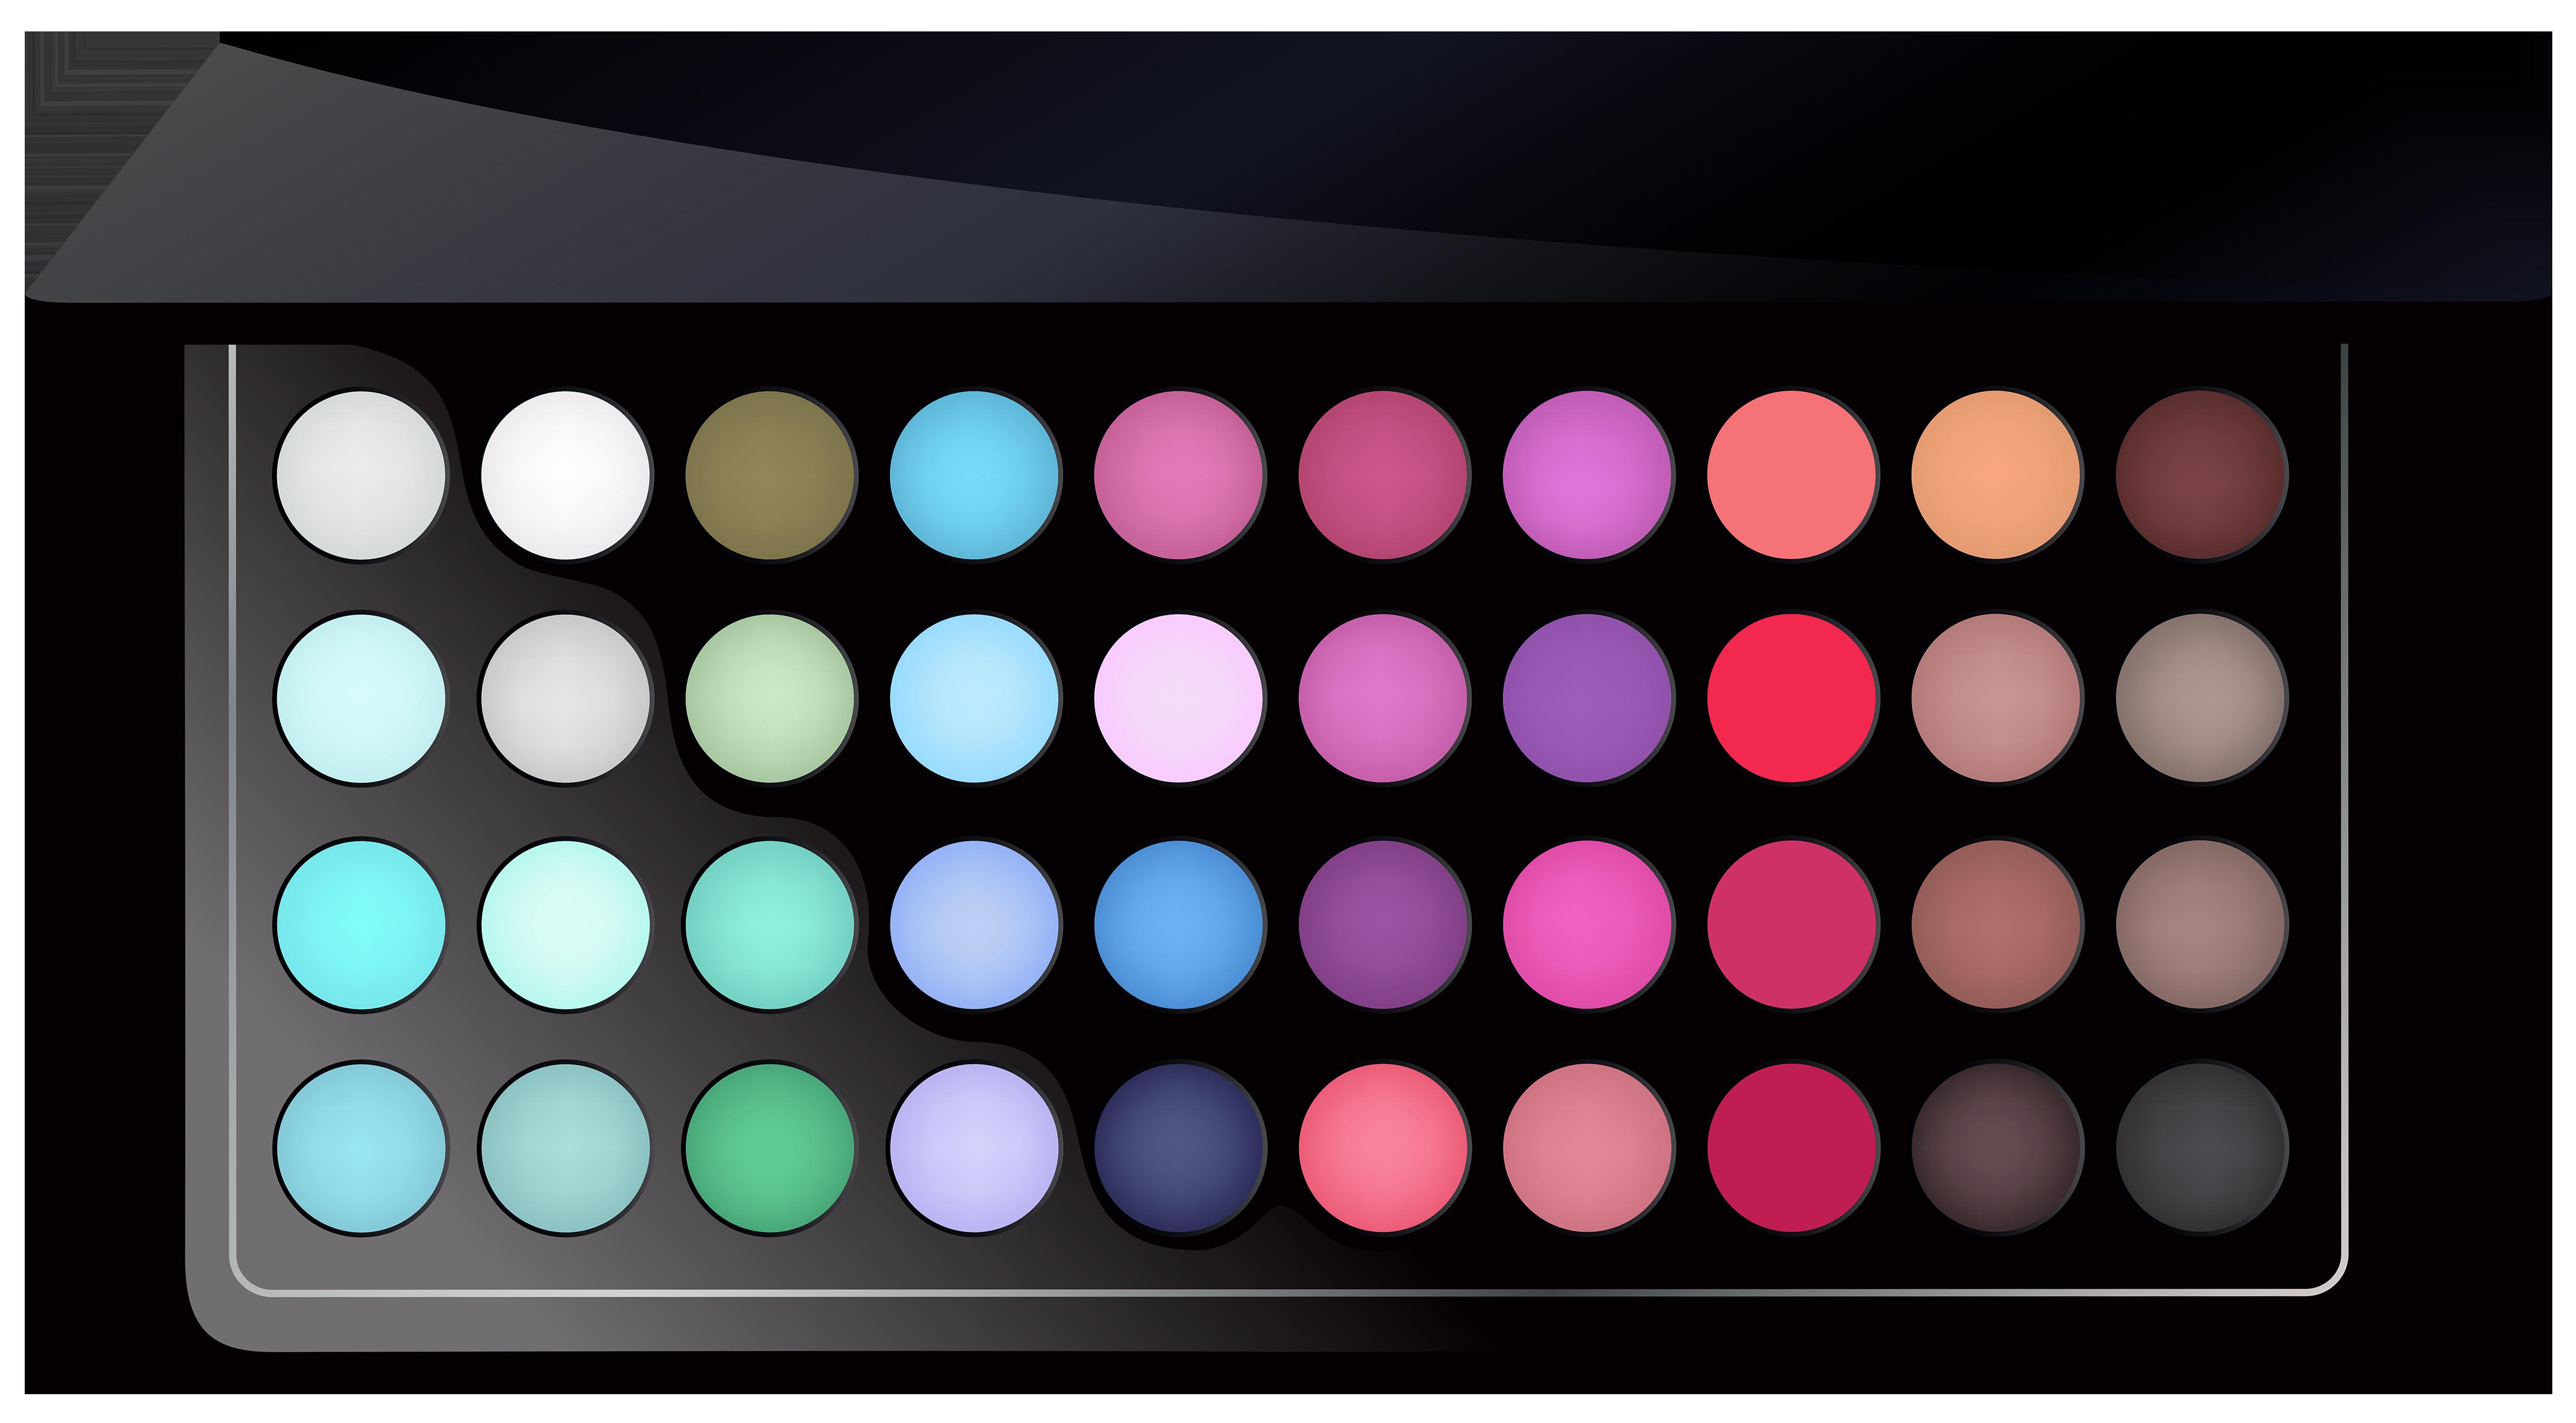 Eyeshadows clipart graphic transparent Free Makeup Cliparts Eyeshadow, Download Free Clip Art, Free Clip ... graphic transparent